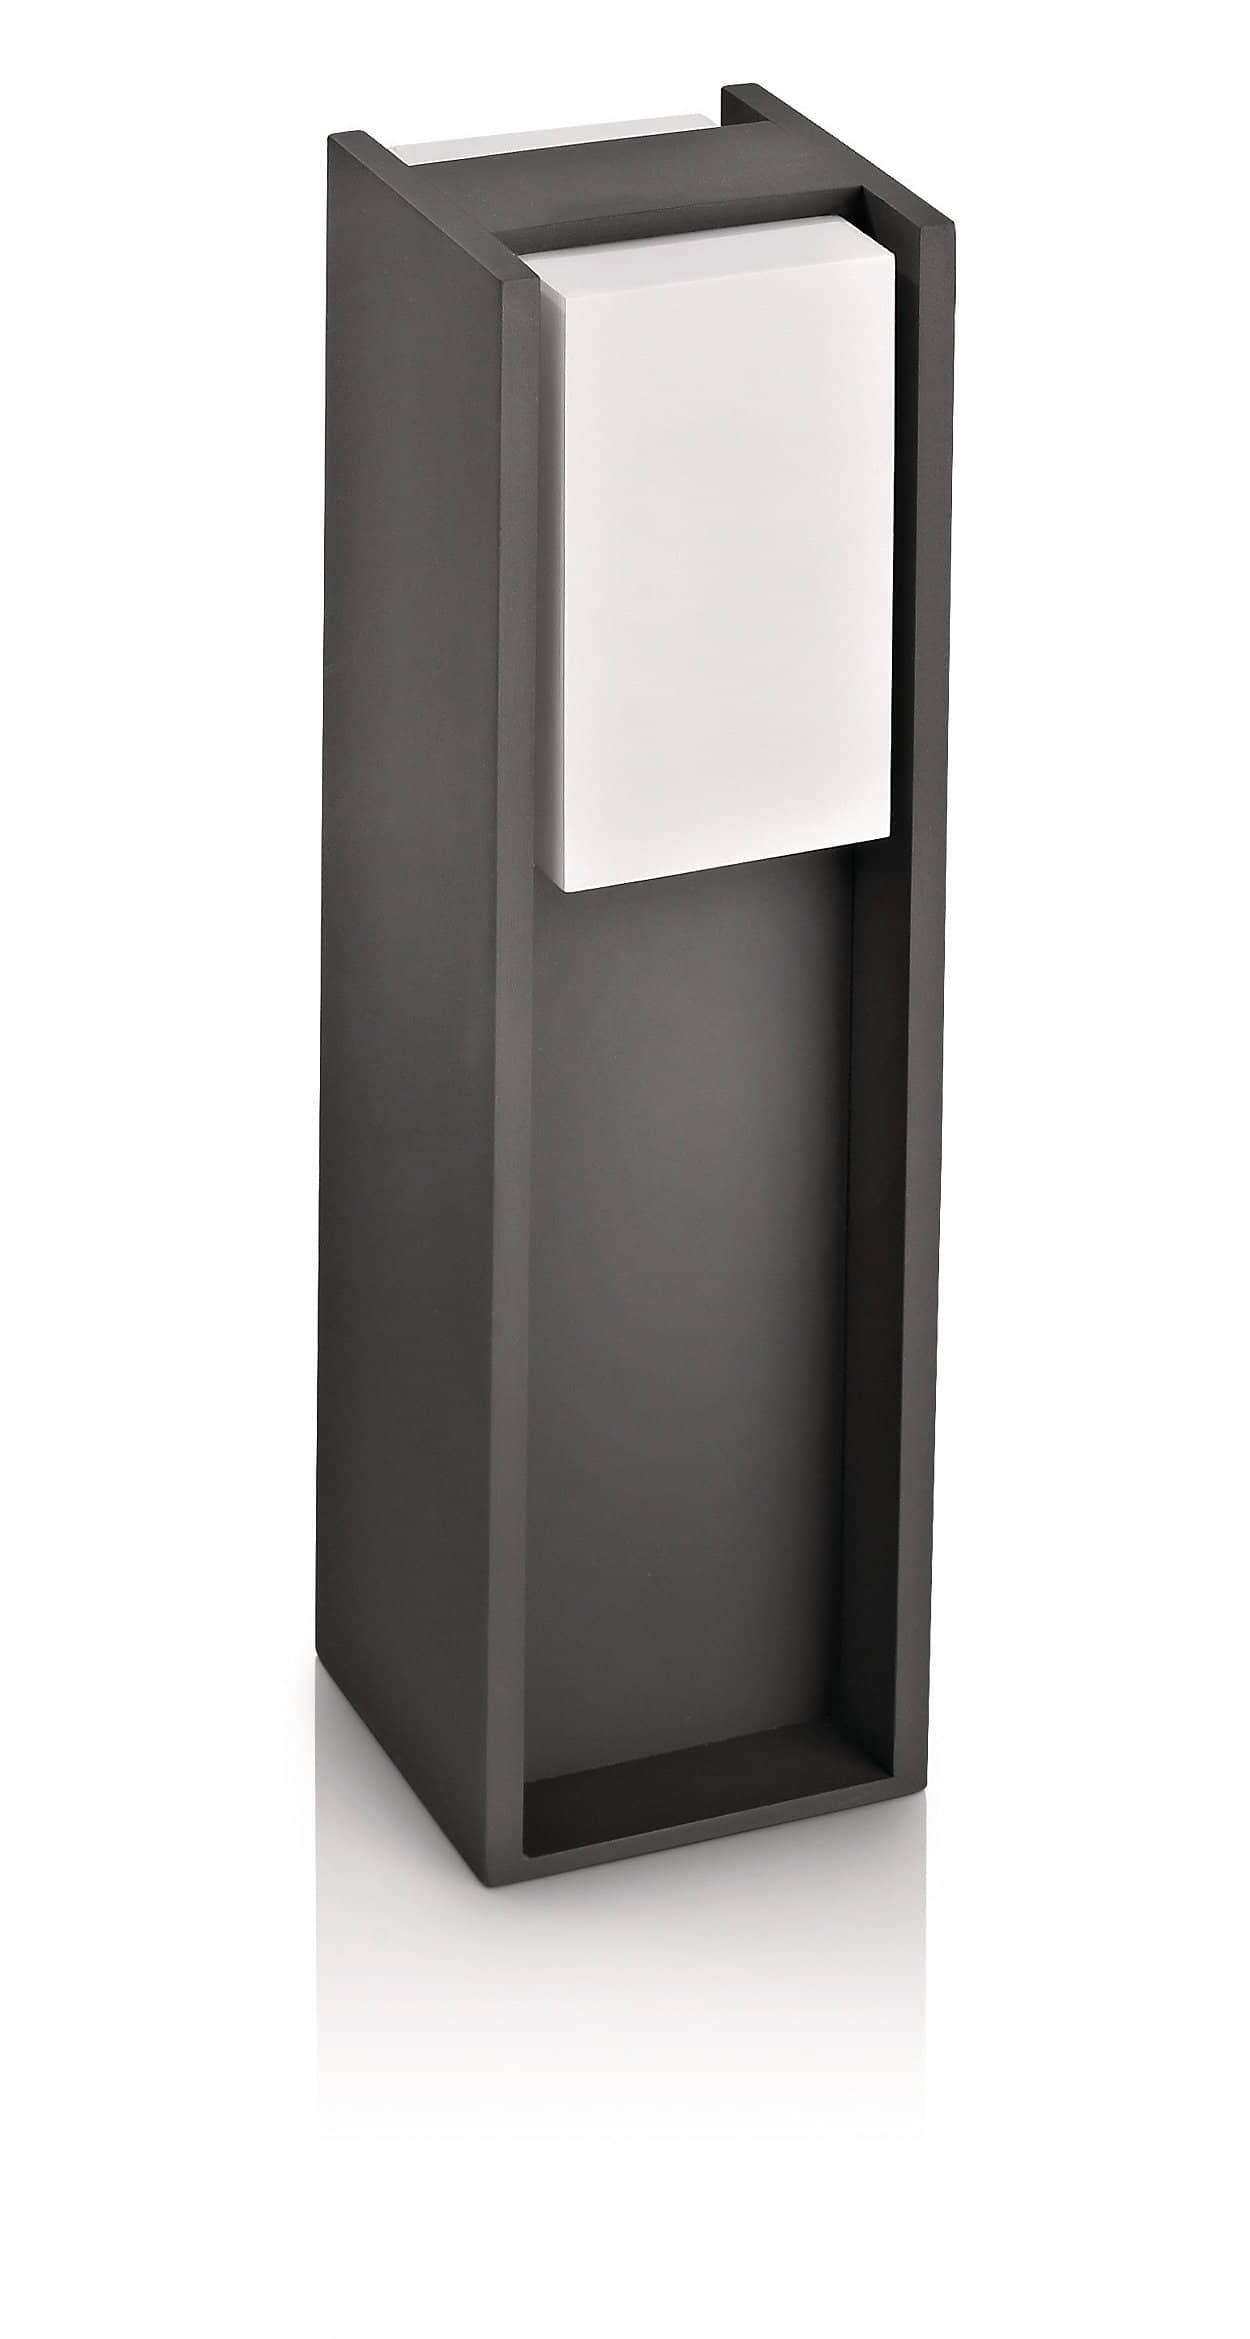 philips es sockelleuchte ecomoods bridge 14w anthrazit. Black Bedroom Furniture Sets. Home Design Ideas